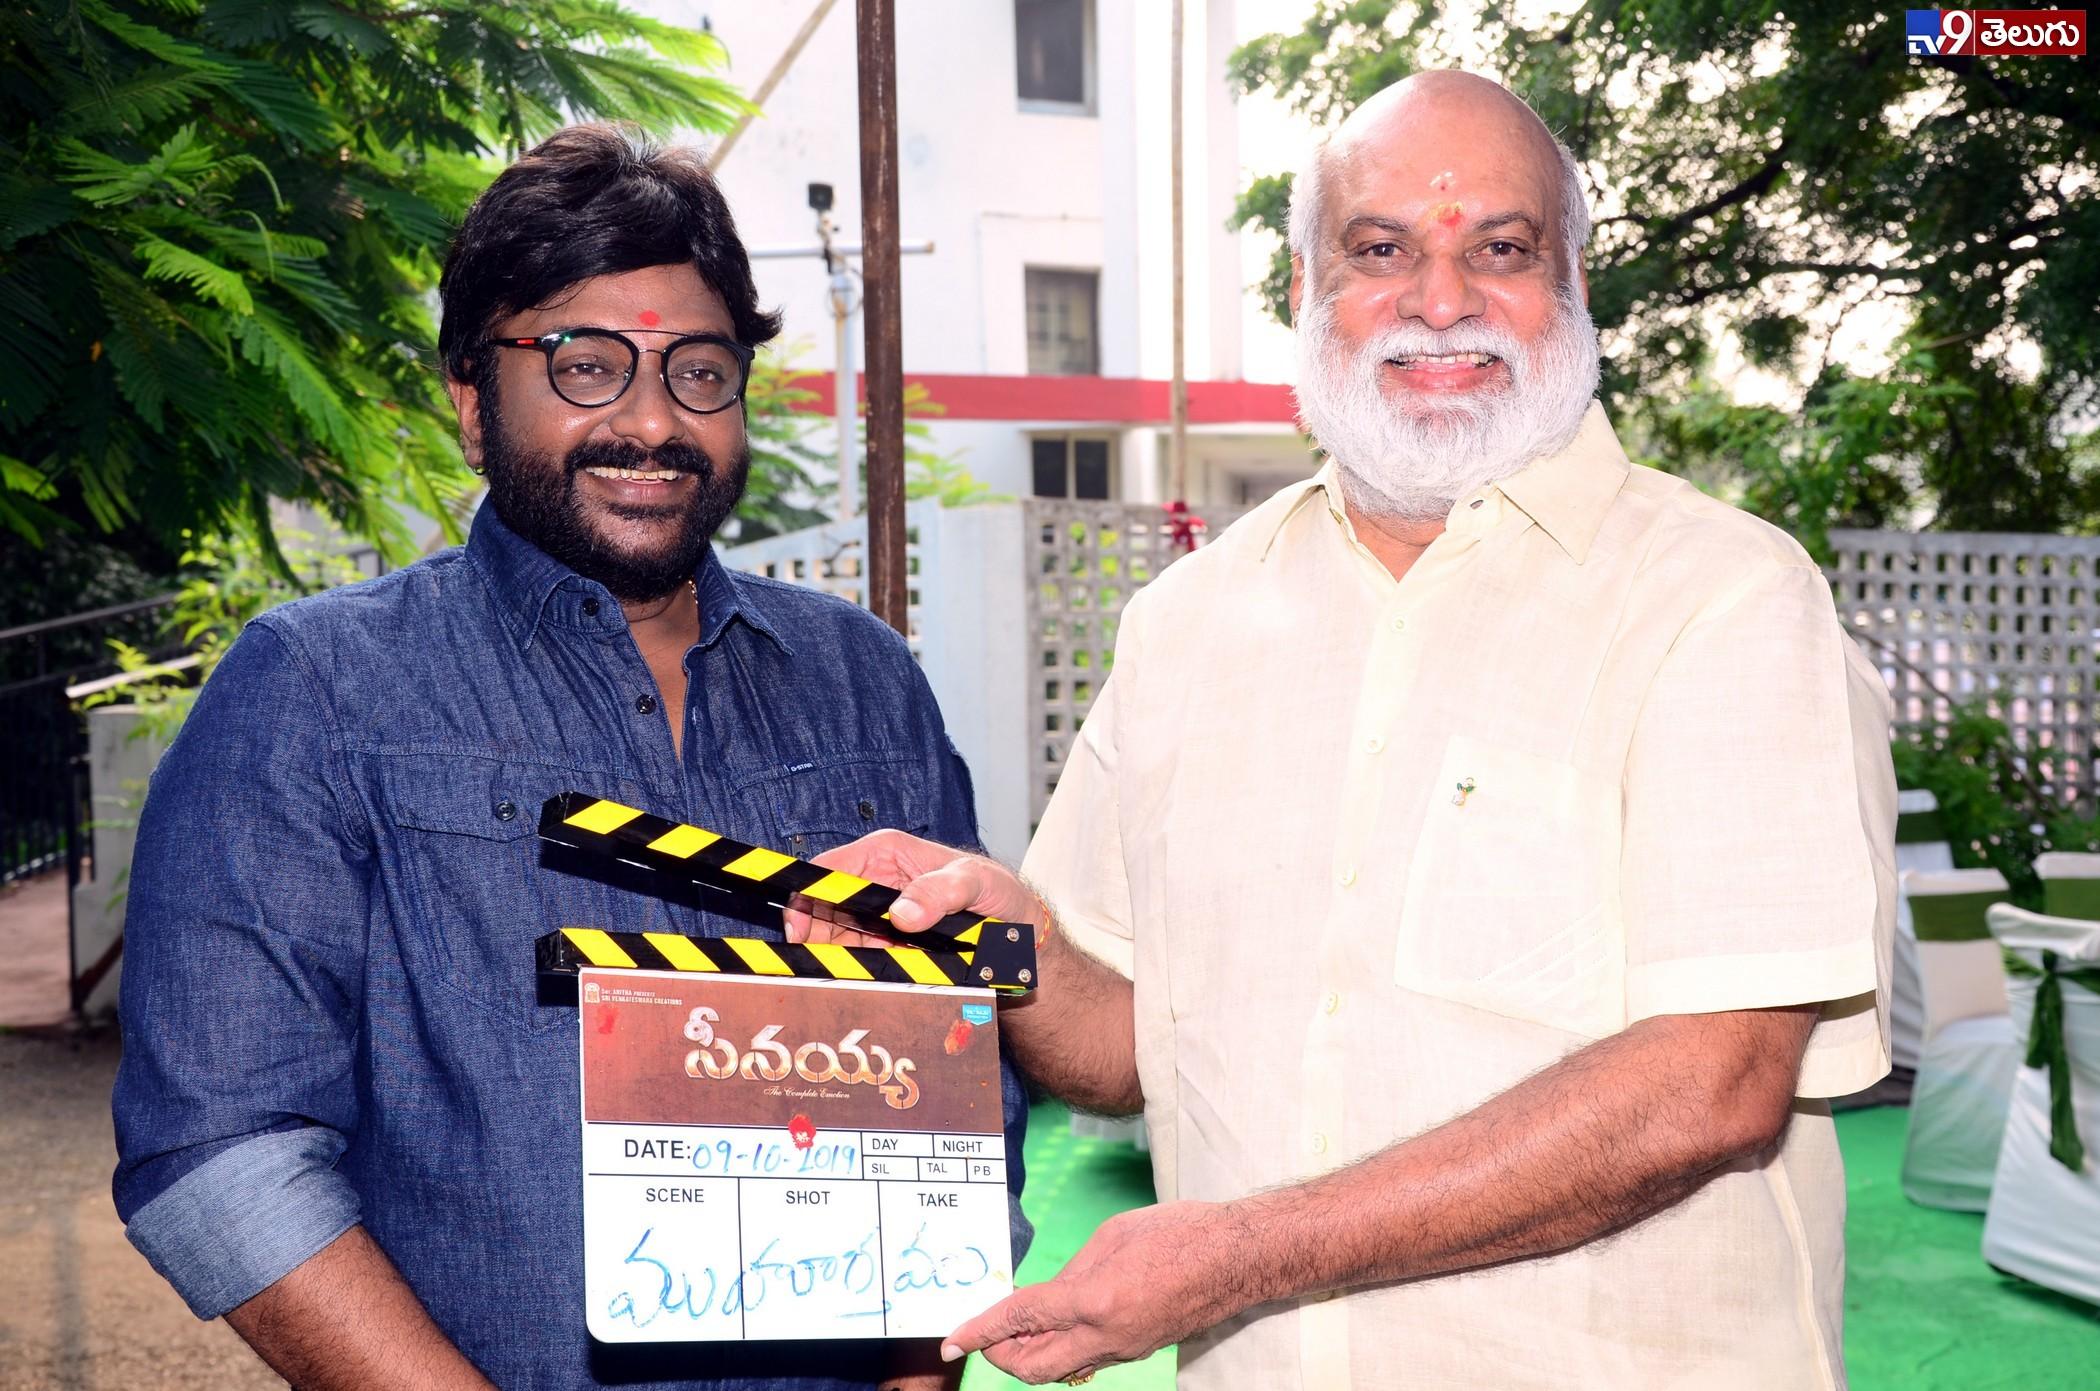 Director VV Vinayak Seenayya Movie launch, వి.వి.వినాయక్ హీరోగా శ్రీ వెంకటేశ్వర క్రియేషన్స్ బ్యానర్పై ప్రారంభమైన `సీనయ్య`